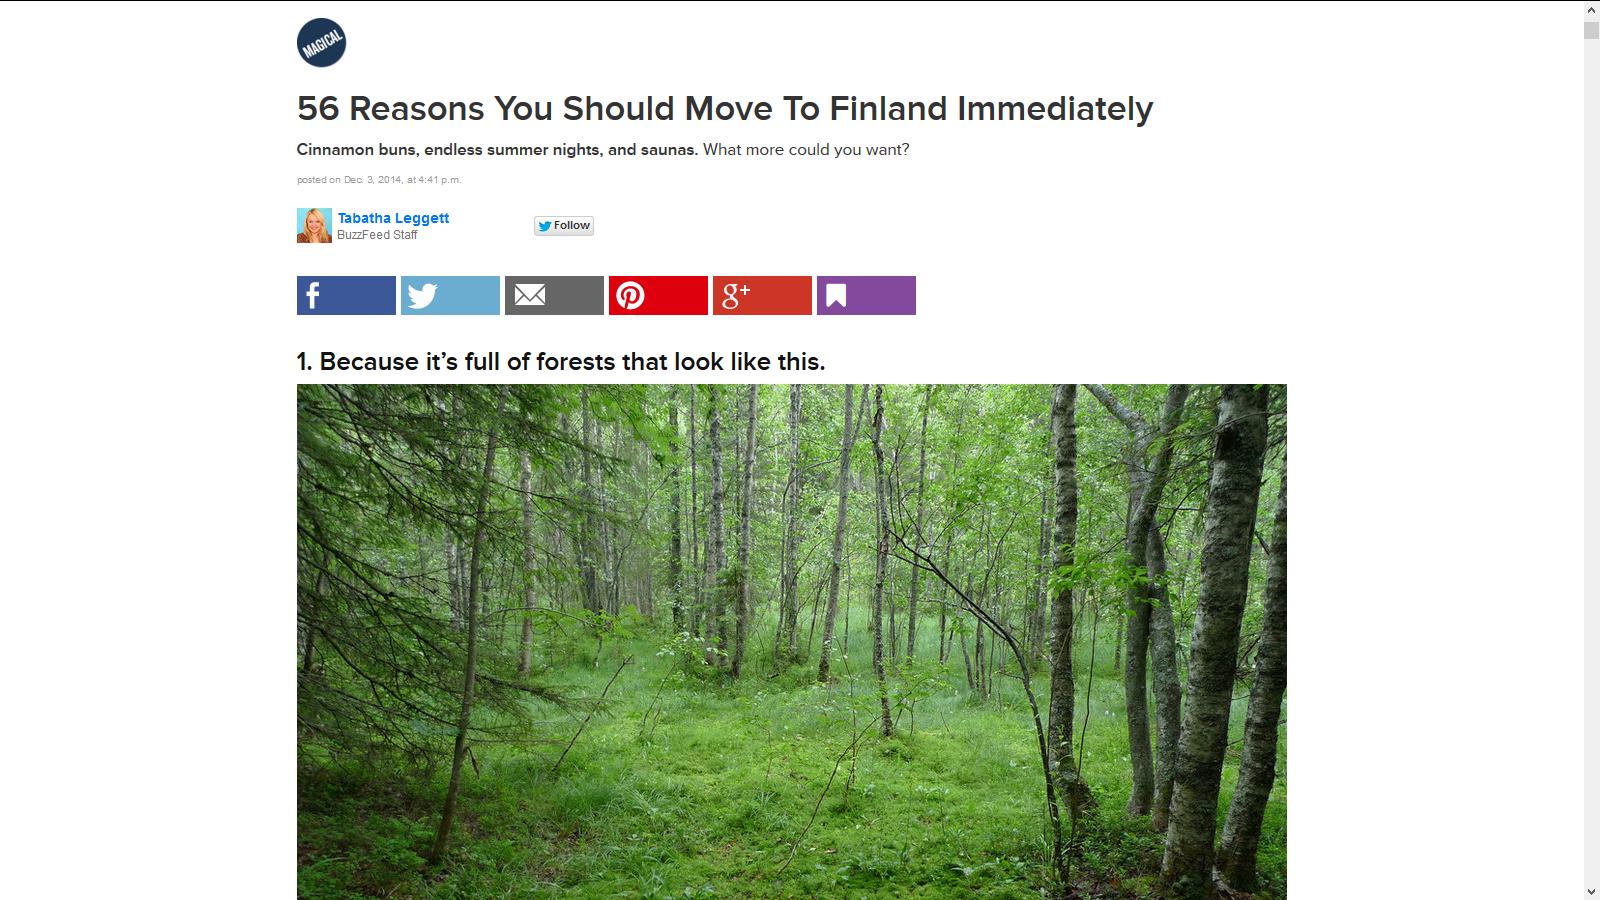 http://www.buzzfeed.com/tabathaleggett/reasons-you-should-never-leave-finland